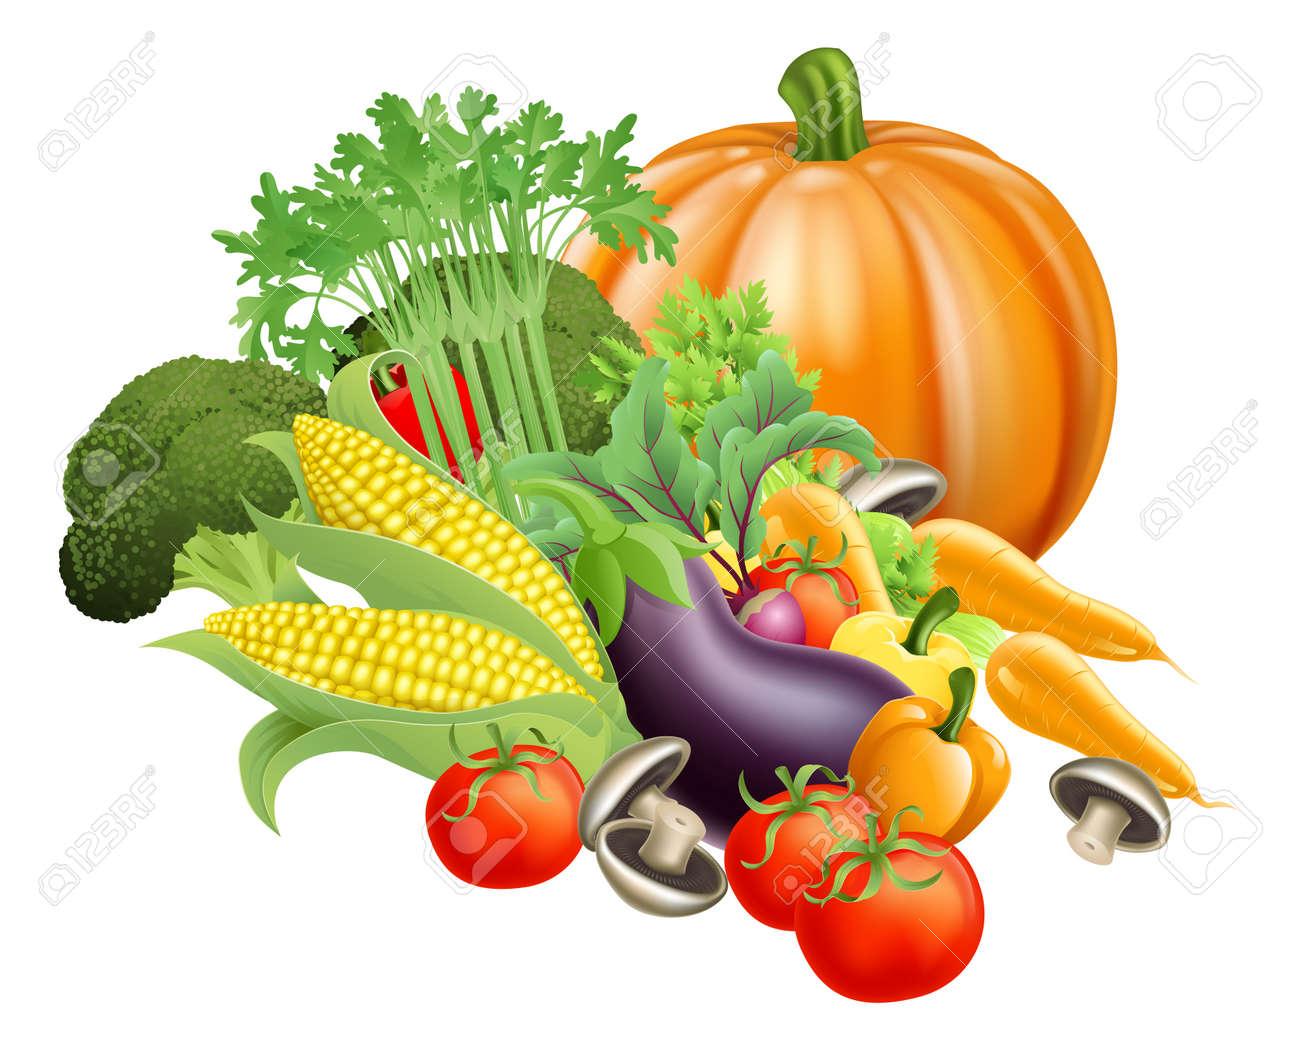 Illustration of produce assortment of healthy fresh vegetables - 15997826